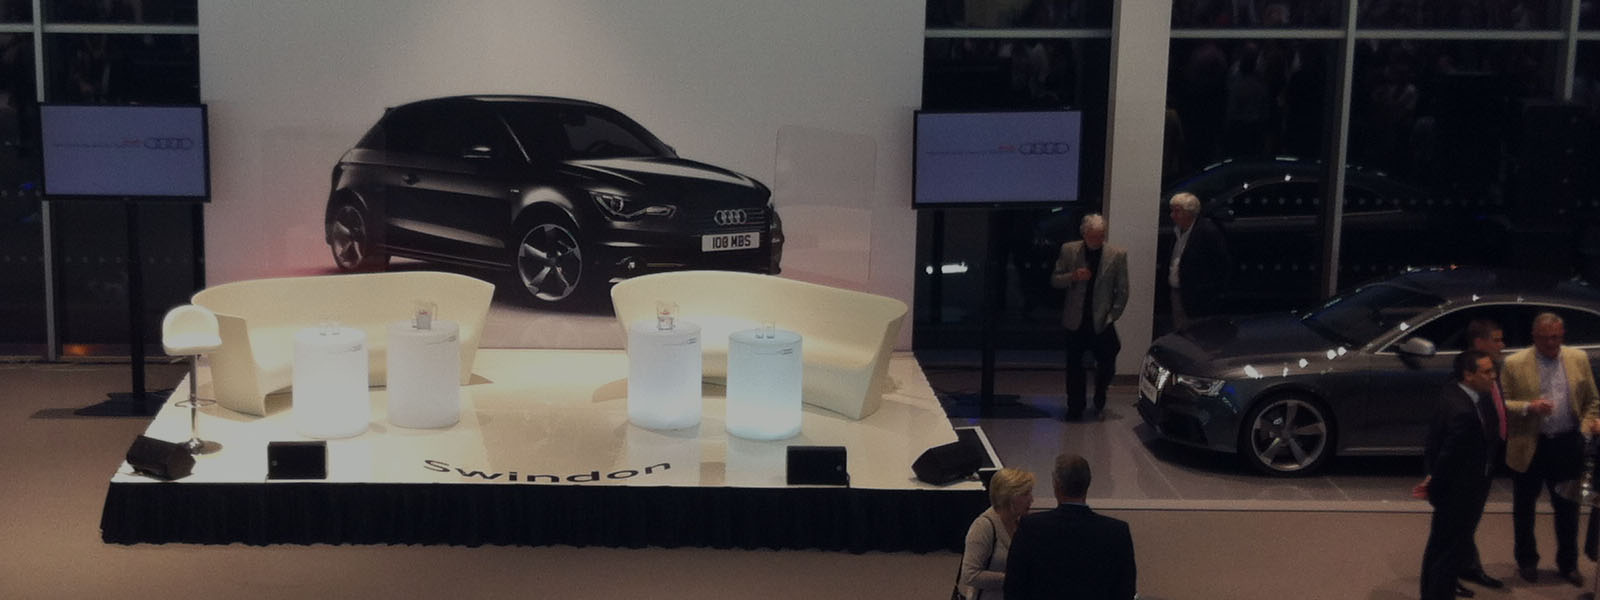 Audi Car Showroom Launch Presentation – Audi UK